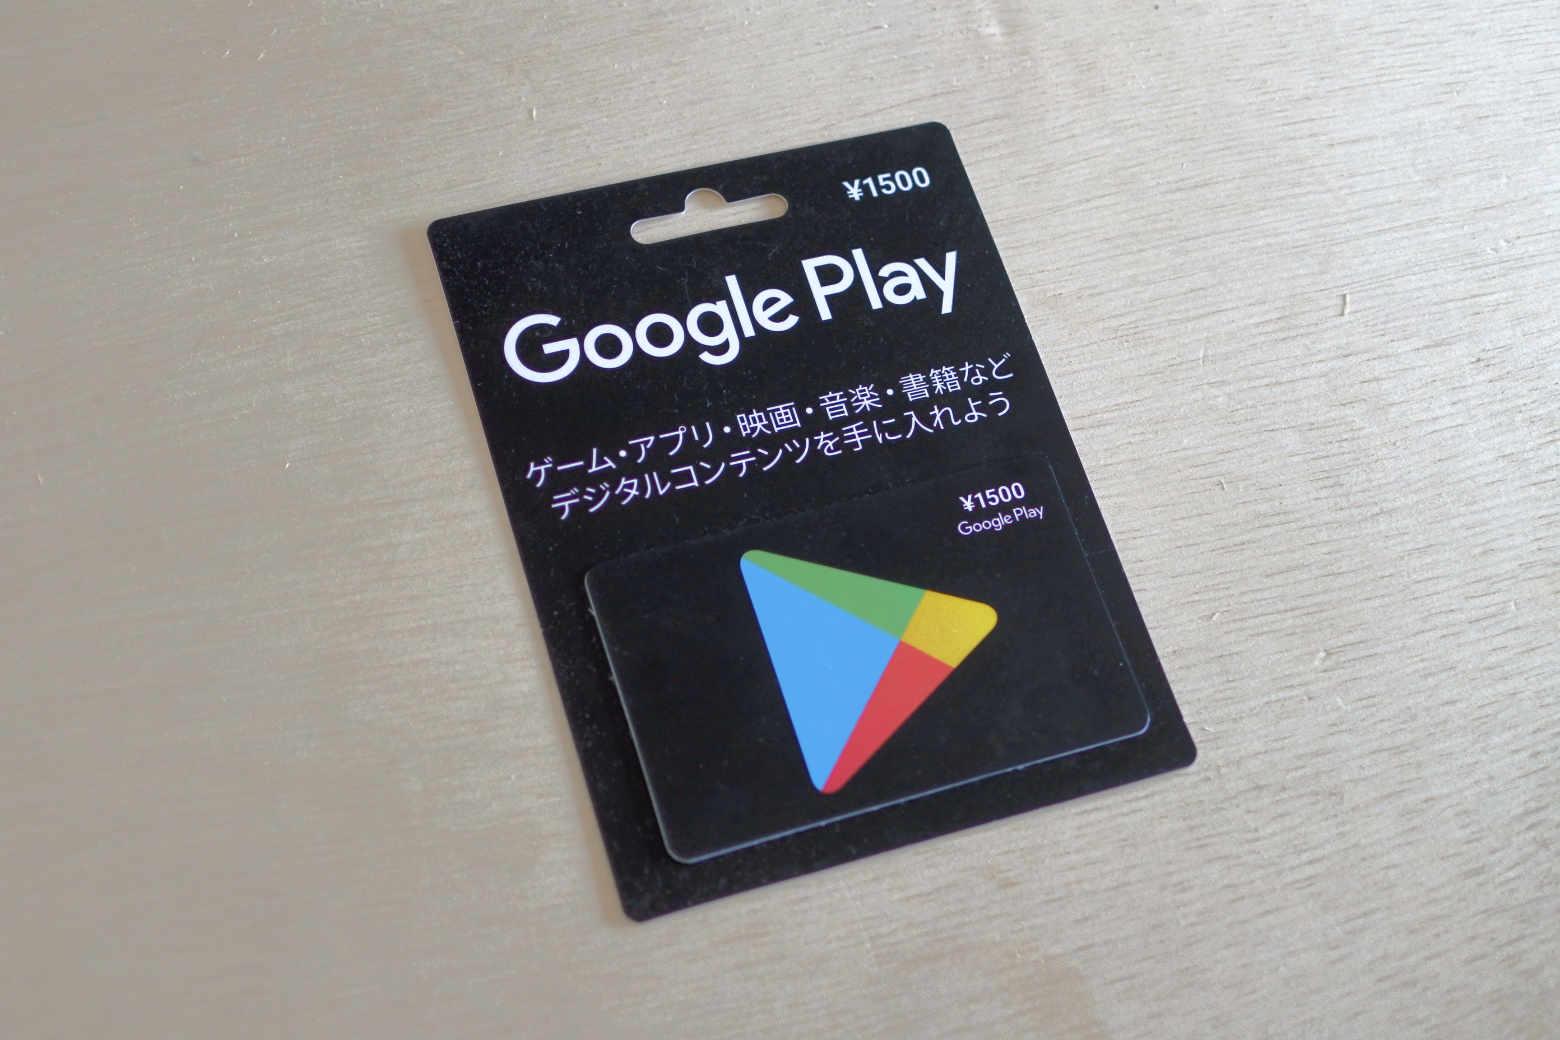 GooglePlayカード:クレジットをチャージする方法と残額の確認【Android/使い方】